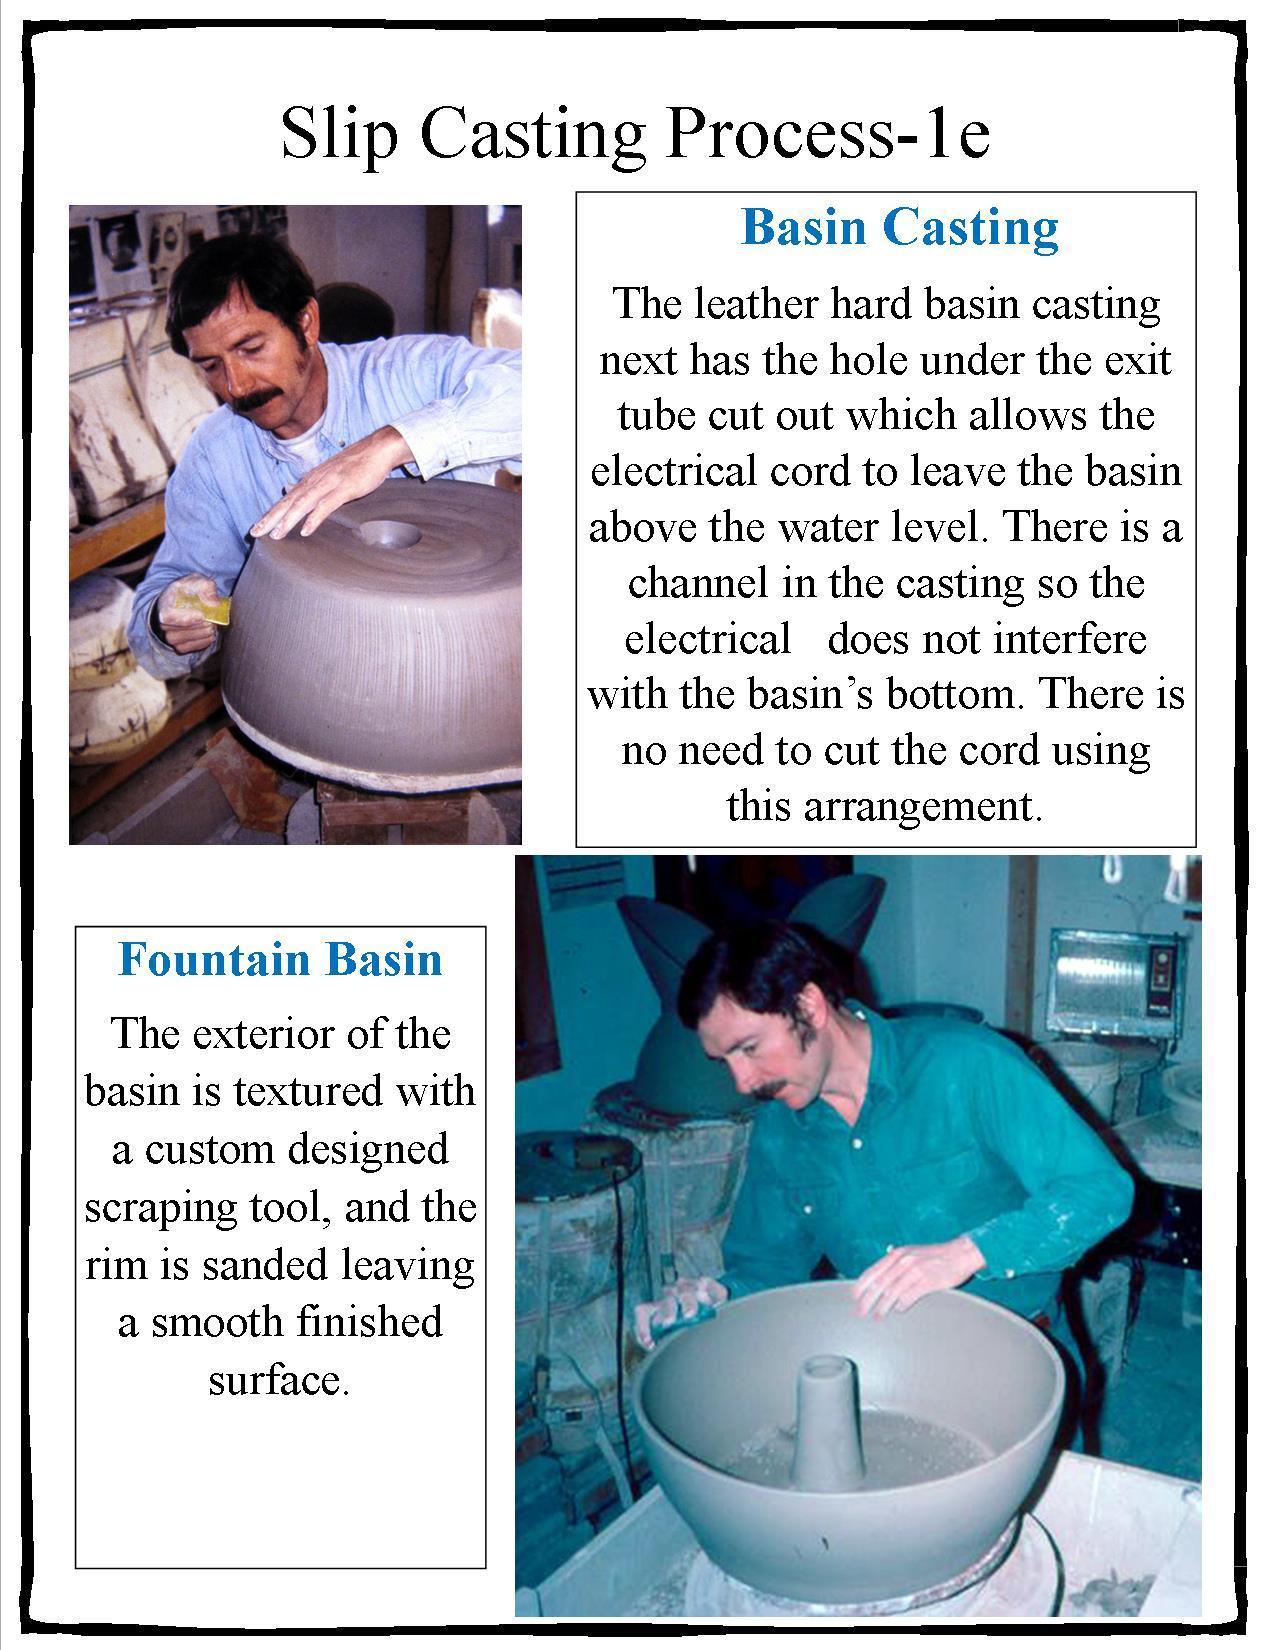 Slip Casting Process-1e